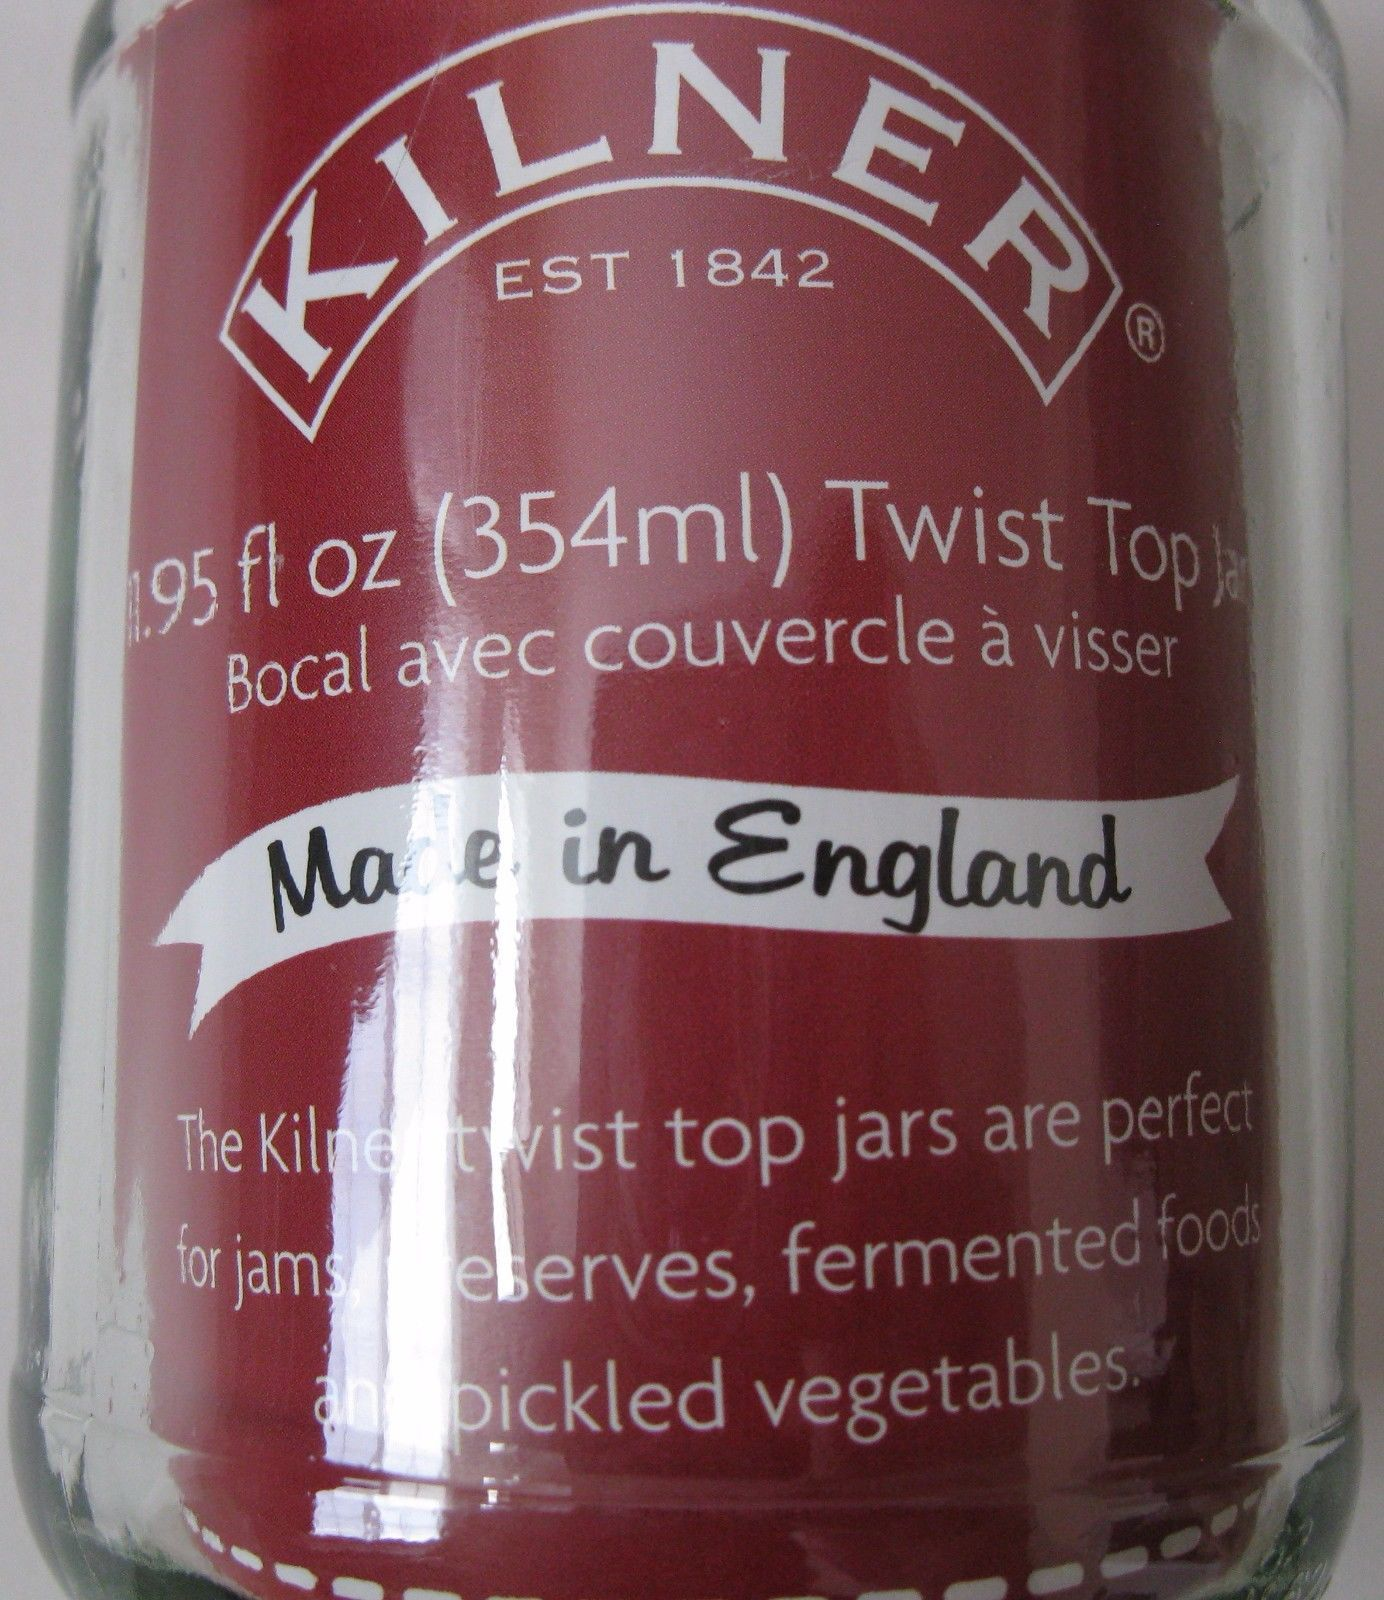 LOT OF 25 KILNER TWIST TOP GLASS JARS 11.95OZ.CANNING PRESERVES ENGLAND NEW